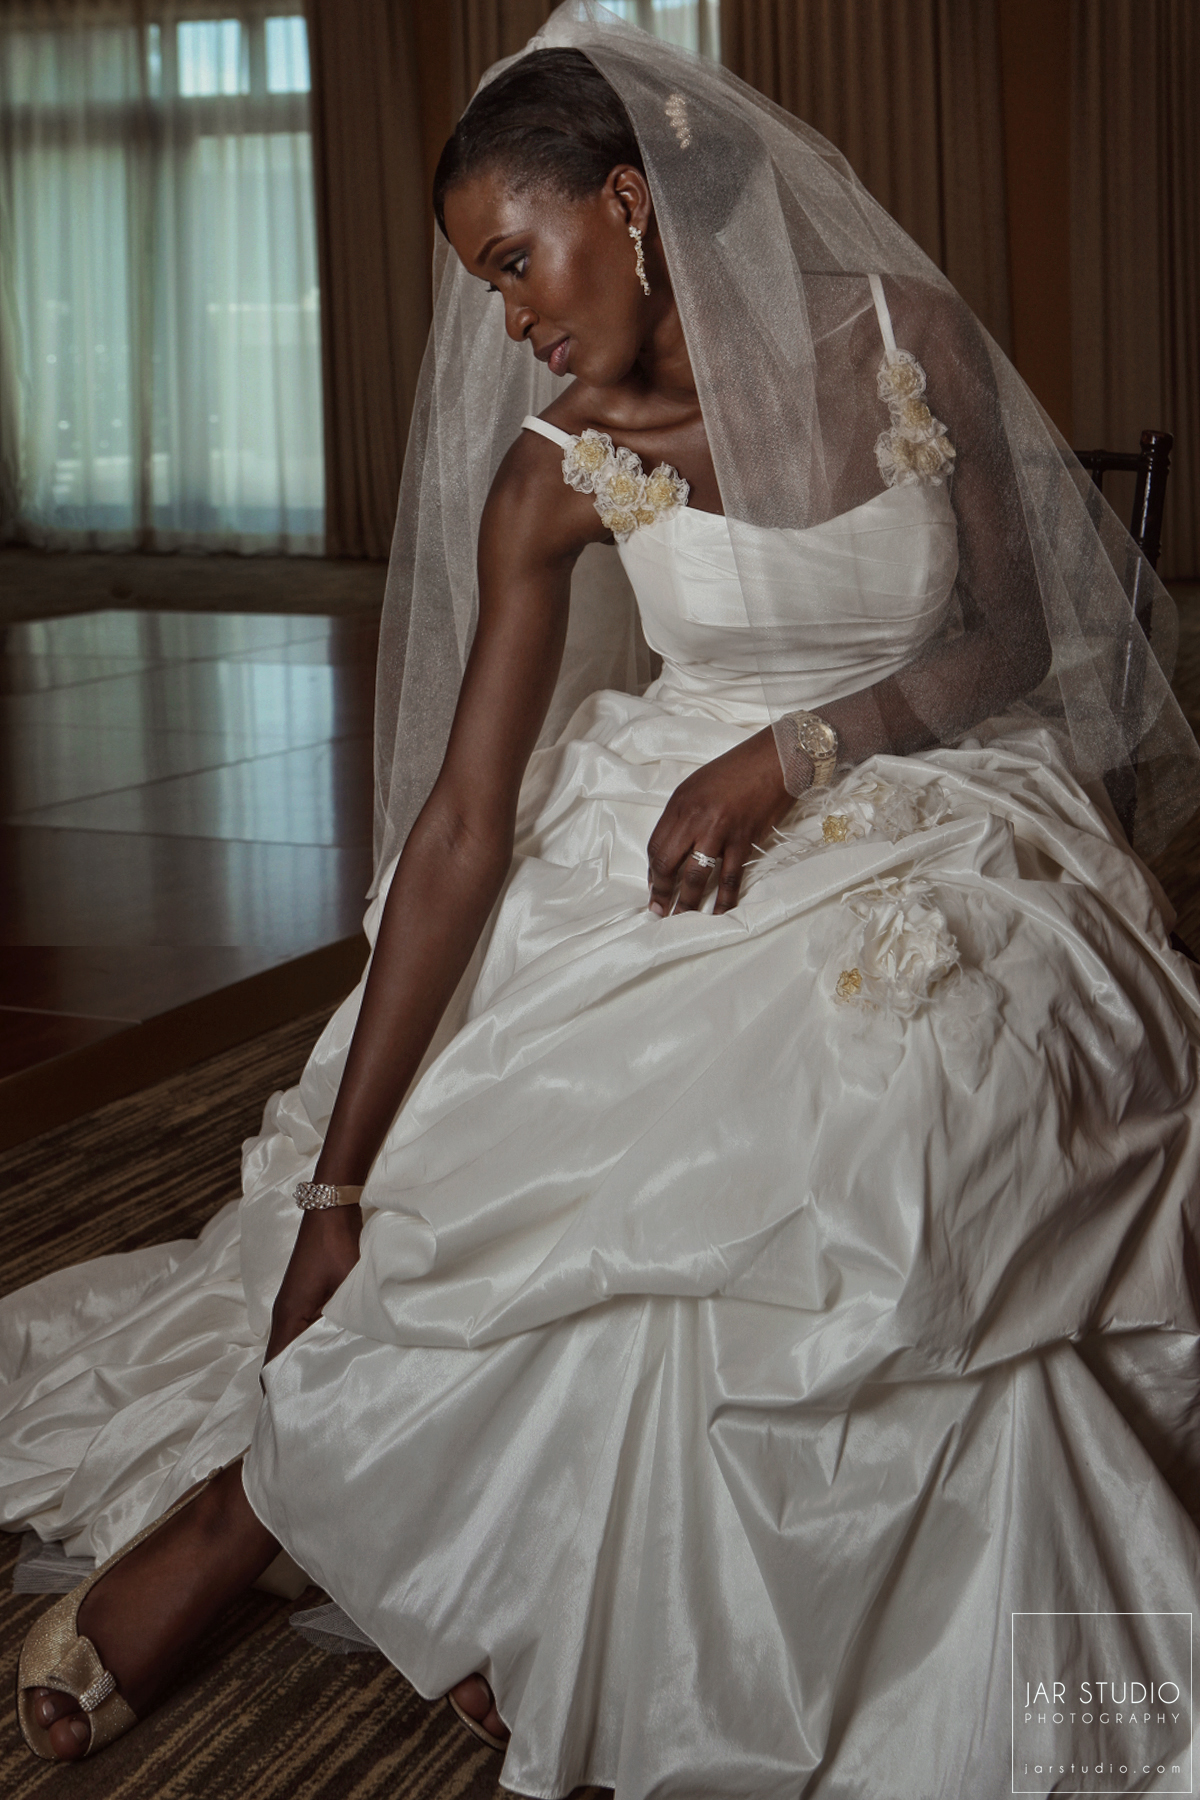 04-gorgeous-bride-portrait-jarstudio-wedding-photography-central-fl.JPG